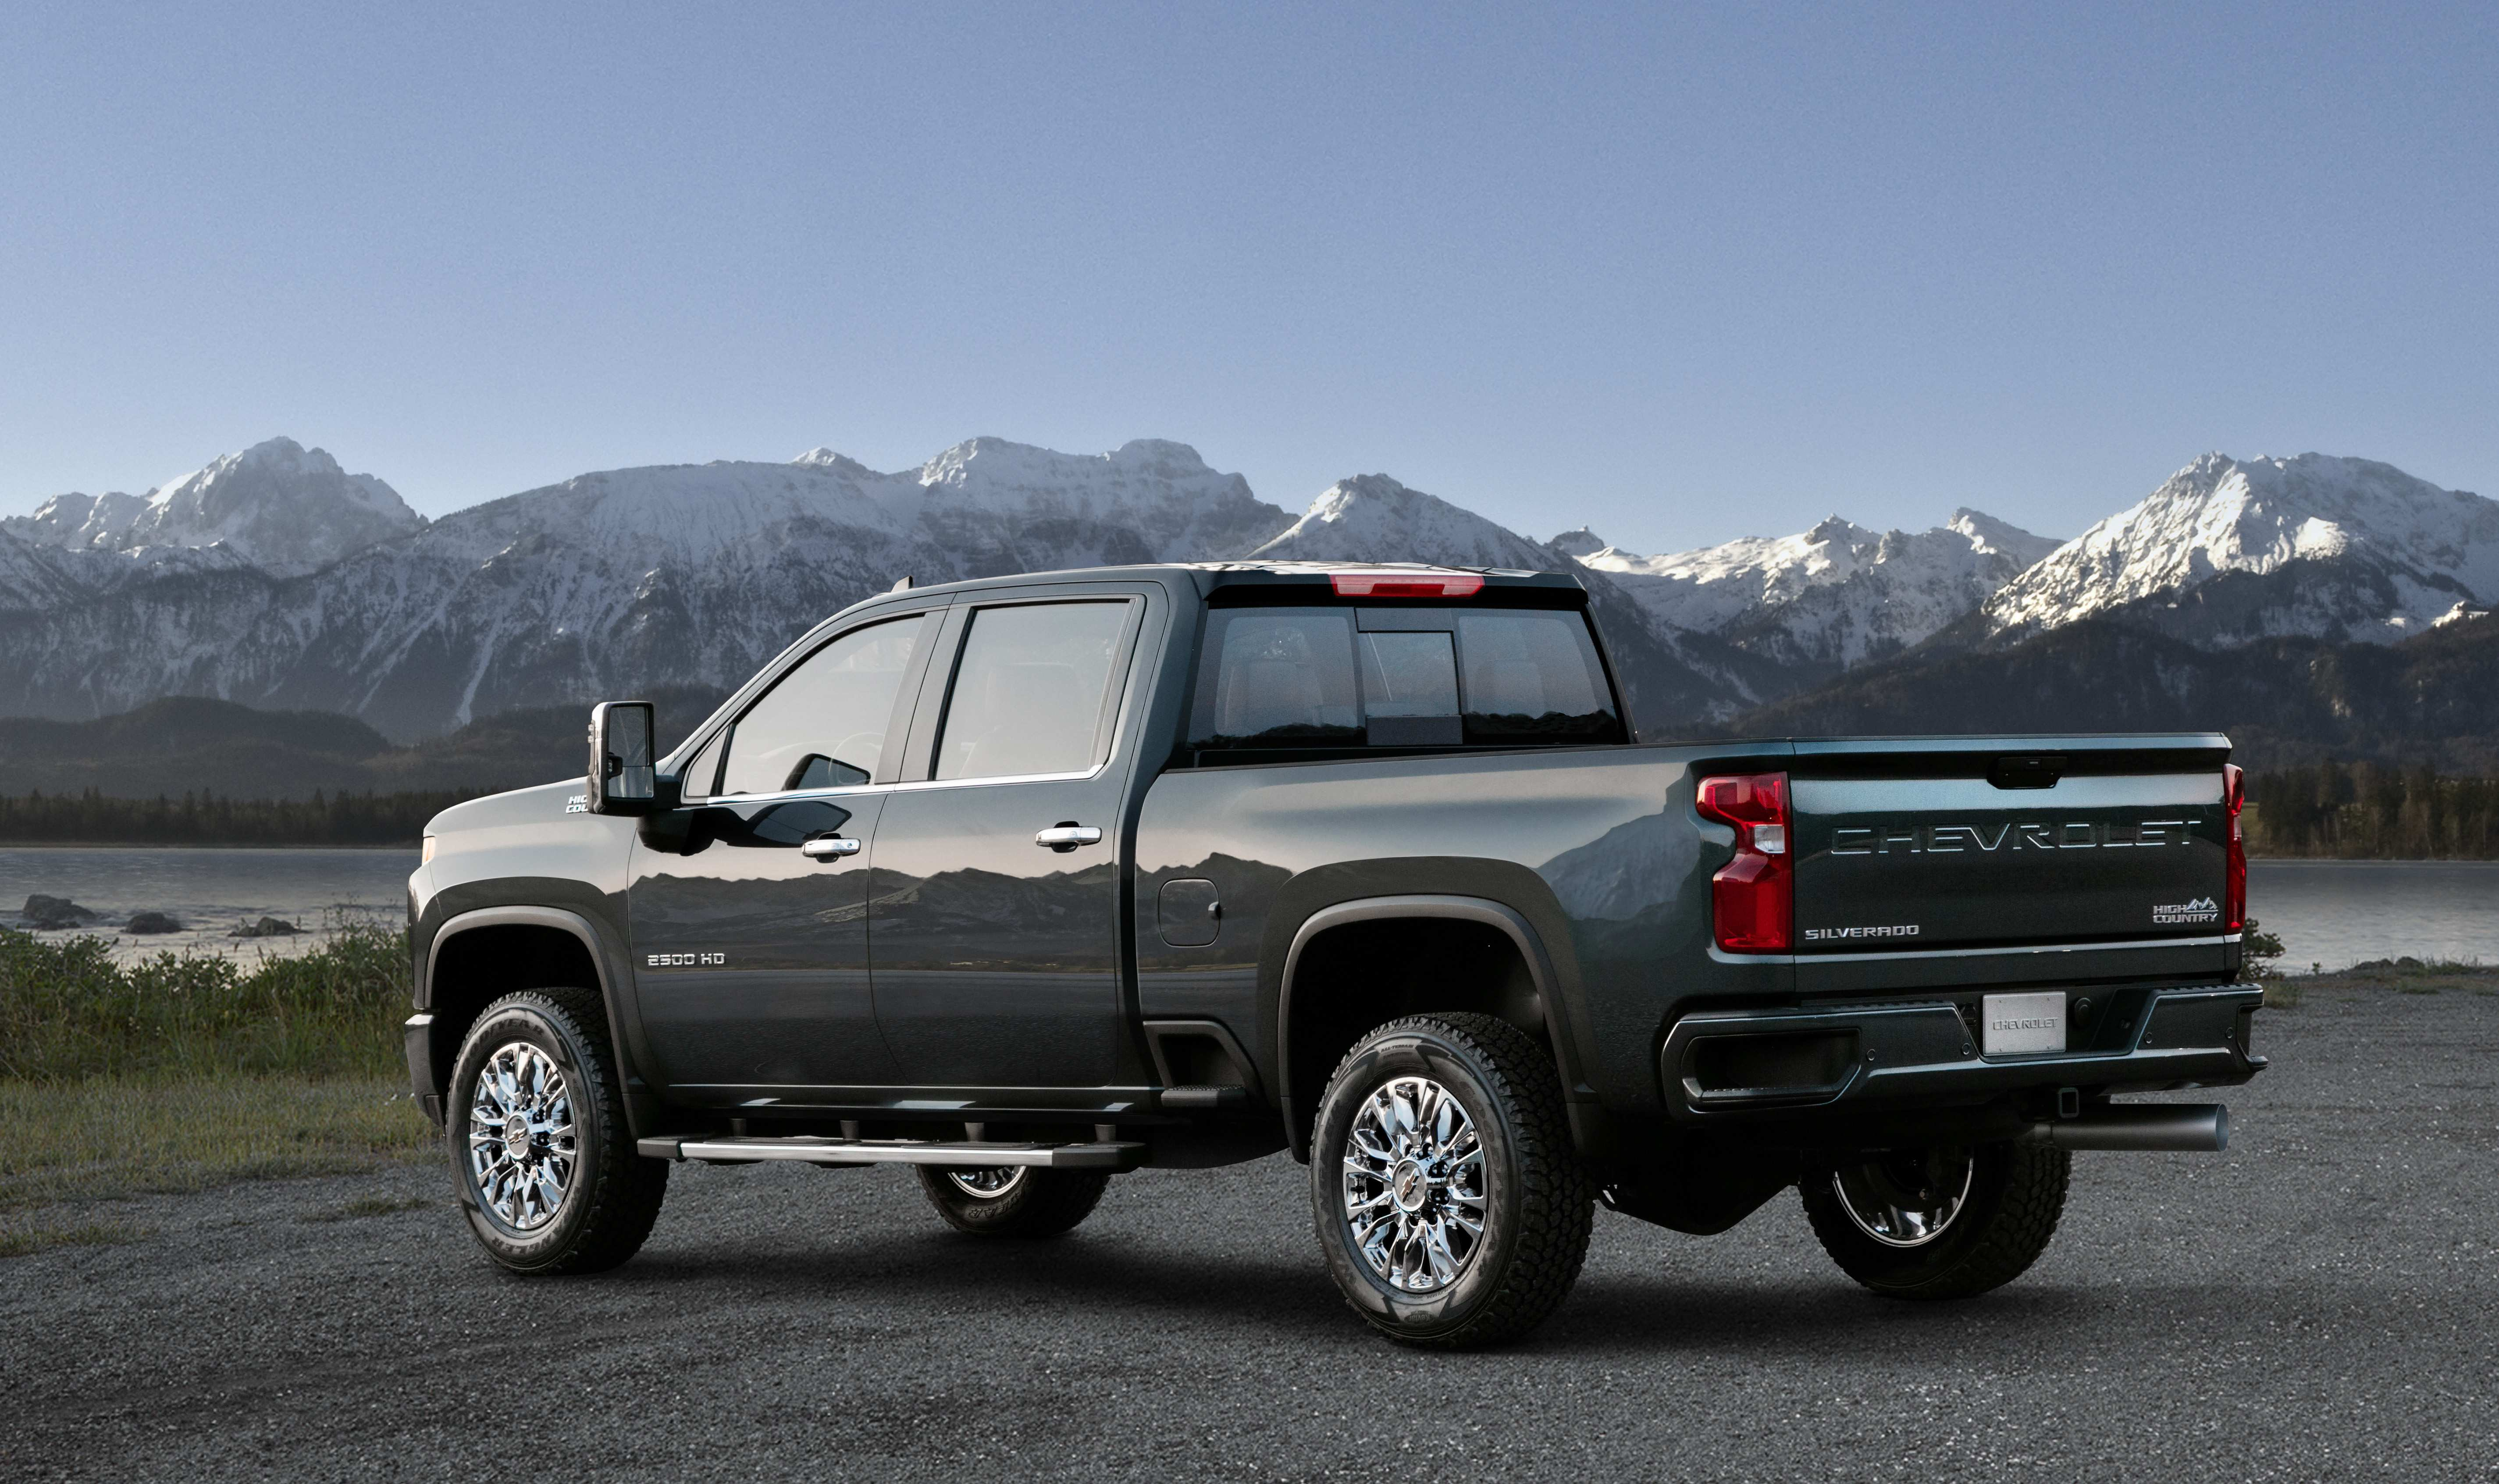 84 New 2020 Chevrolet Hd Model for 2020 Chevrolet Hd